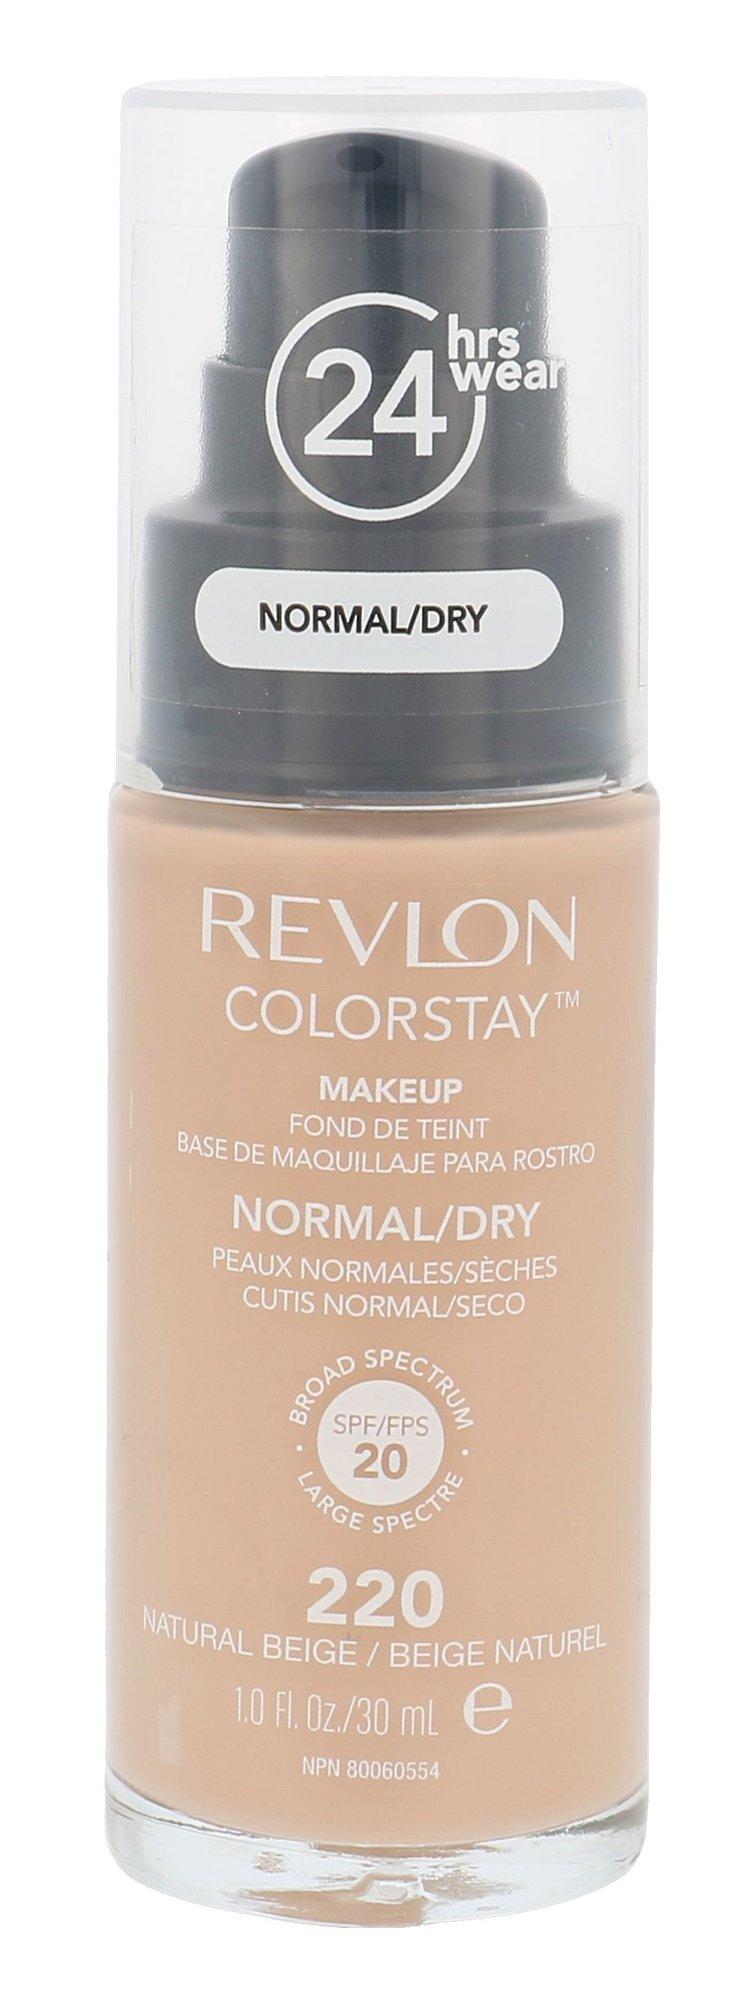 Revlon Colorstay Cosmetic 30ml 220 Natural Beige